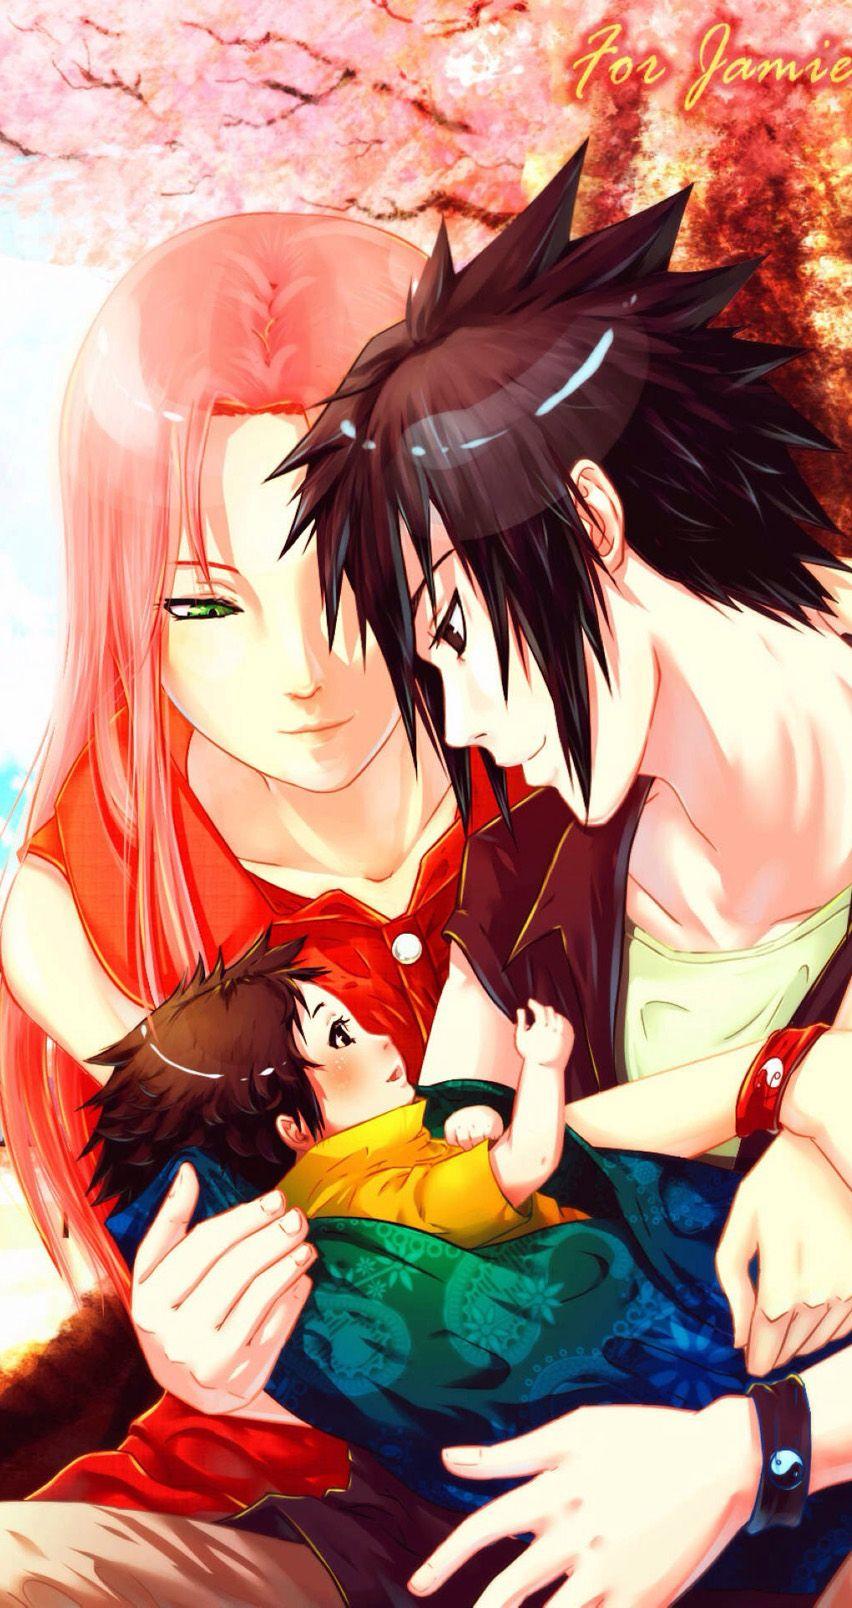 Sasuke X Sakura. Missed Naruto anime/manga? Here's 12